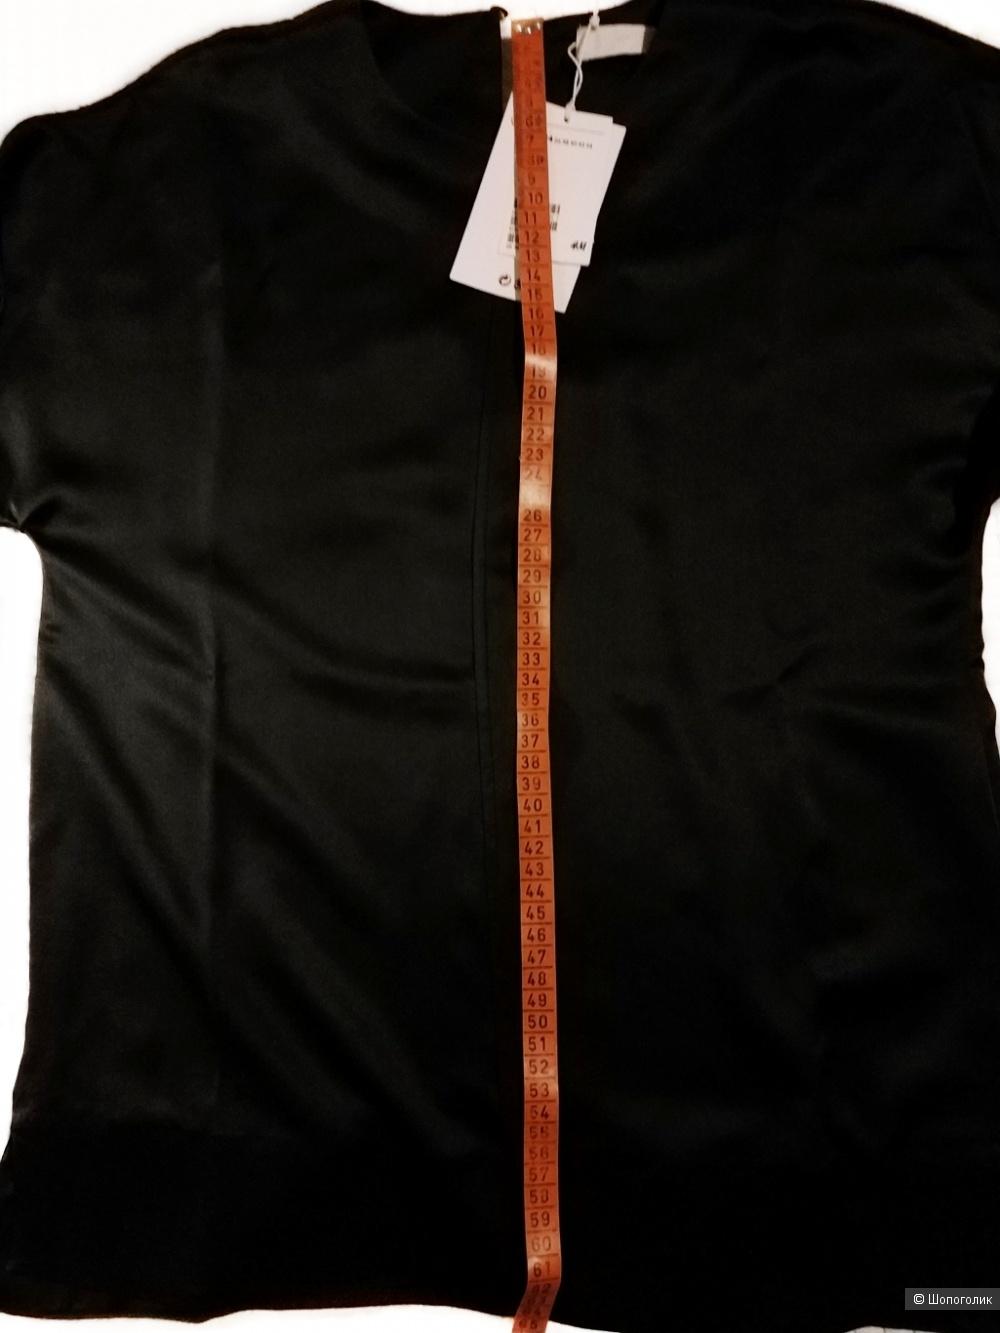 Блузка из натурального шёлка H & M Premium Quality размер 34